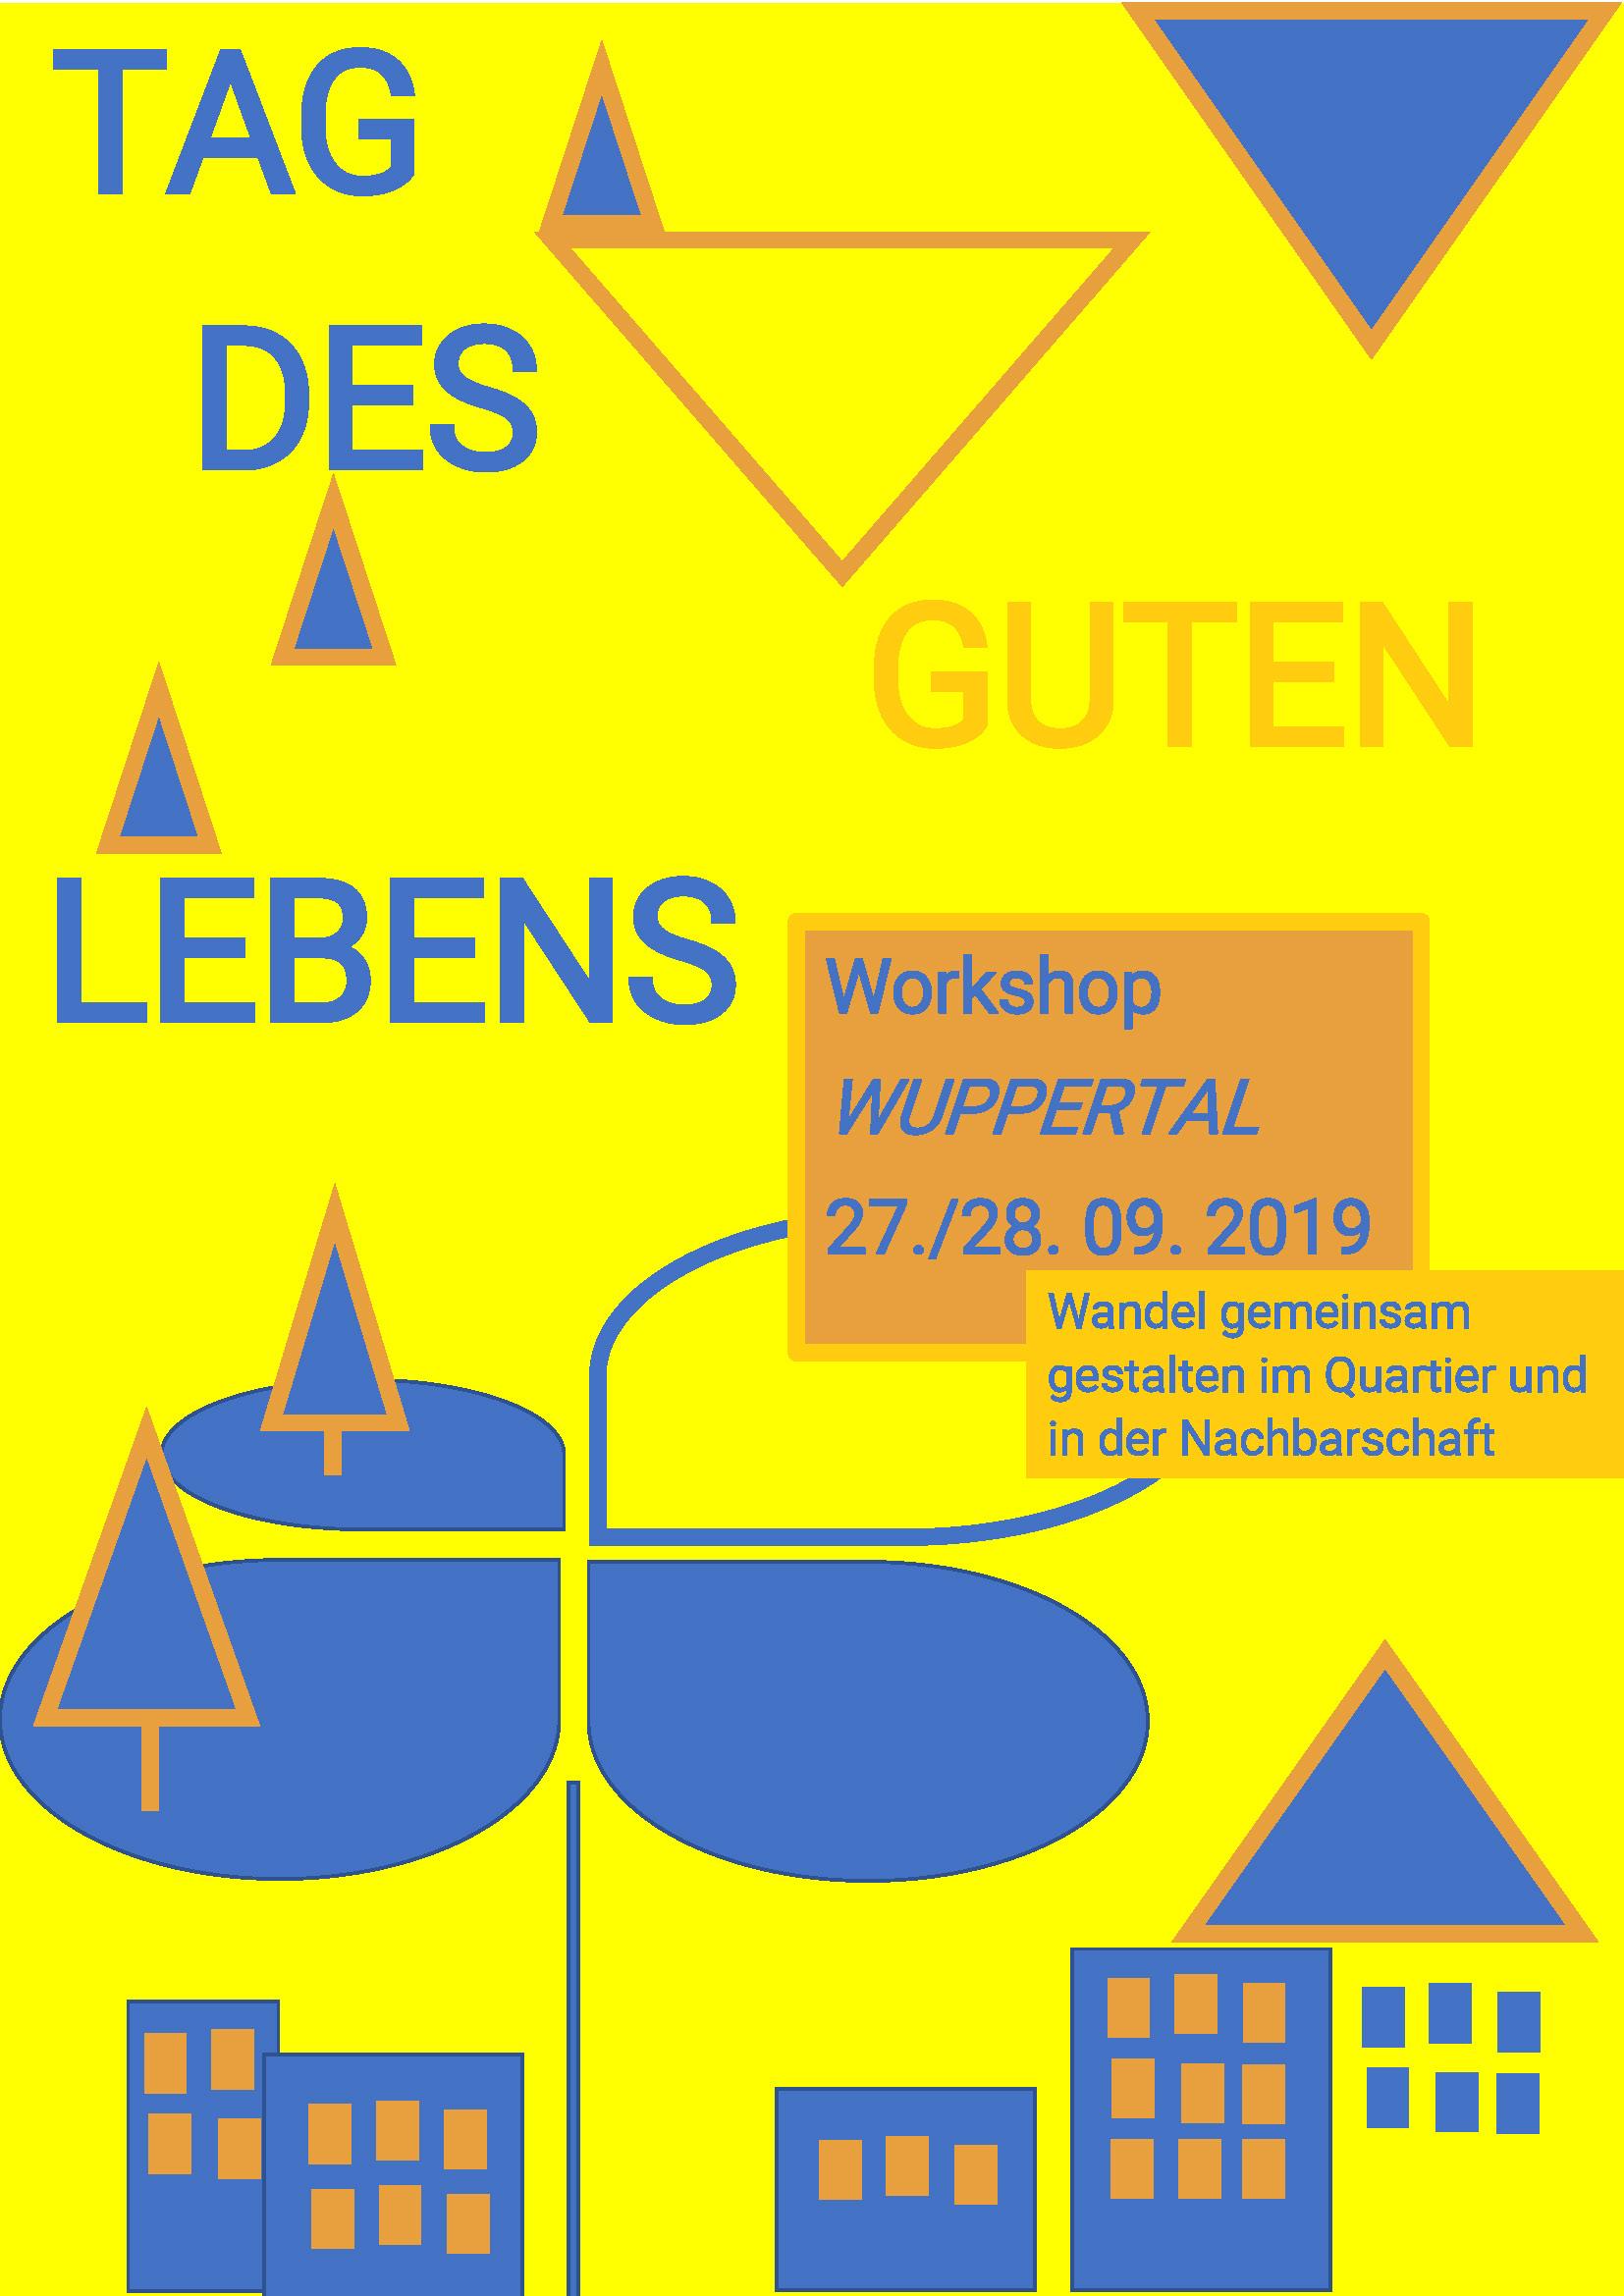 """Tag des guten Leben"" Multiplikator*innen Workshop in Wuppertal"